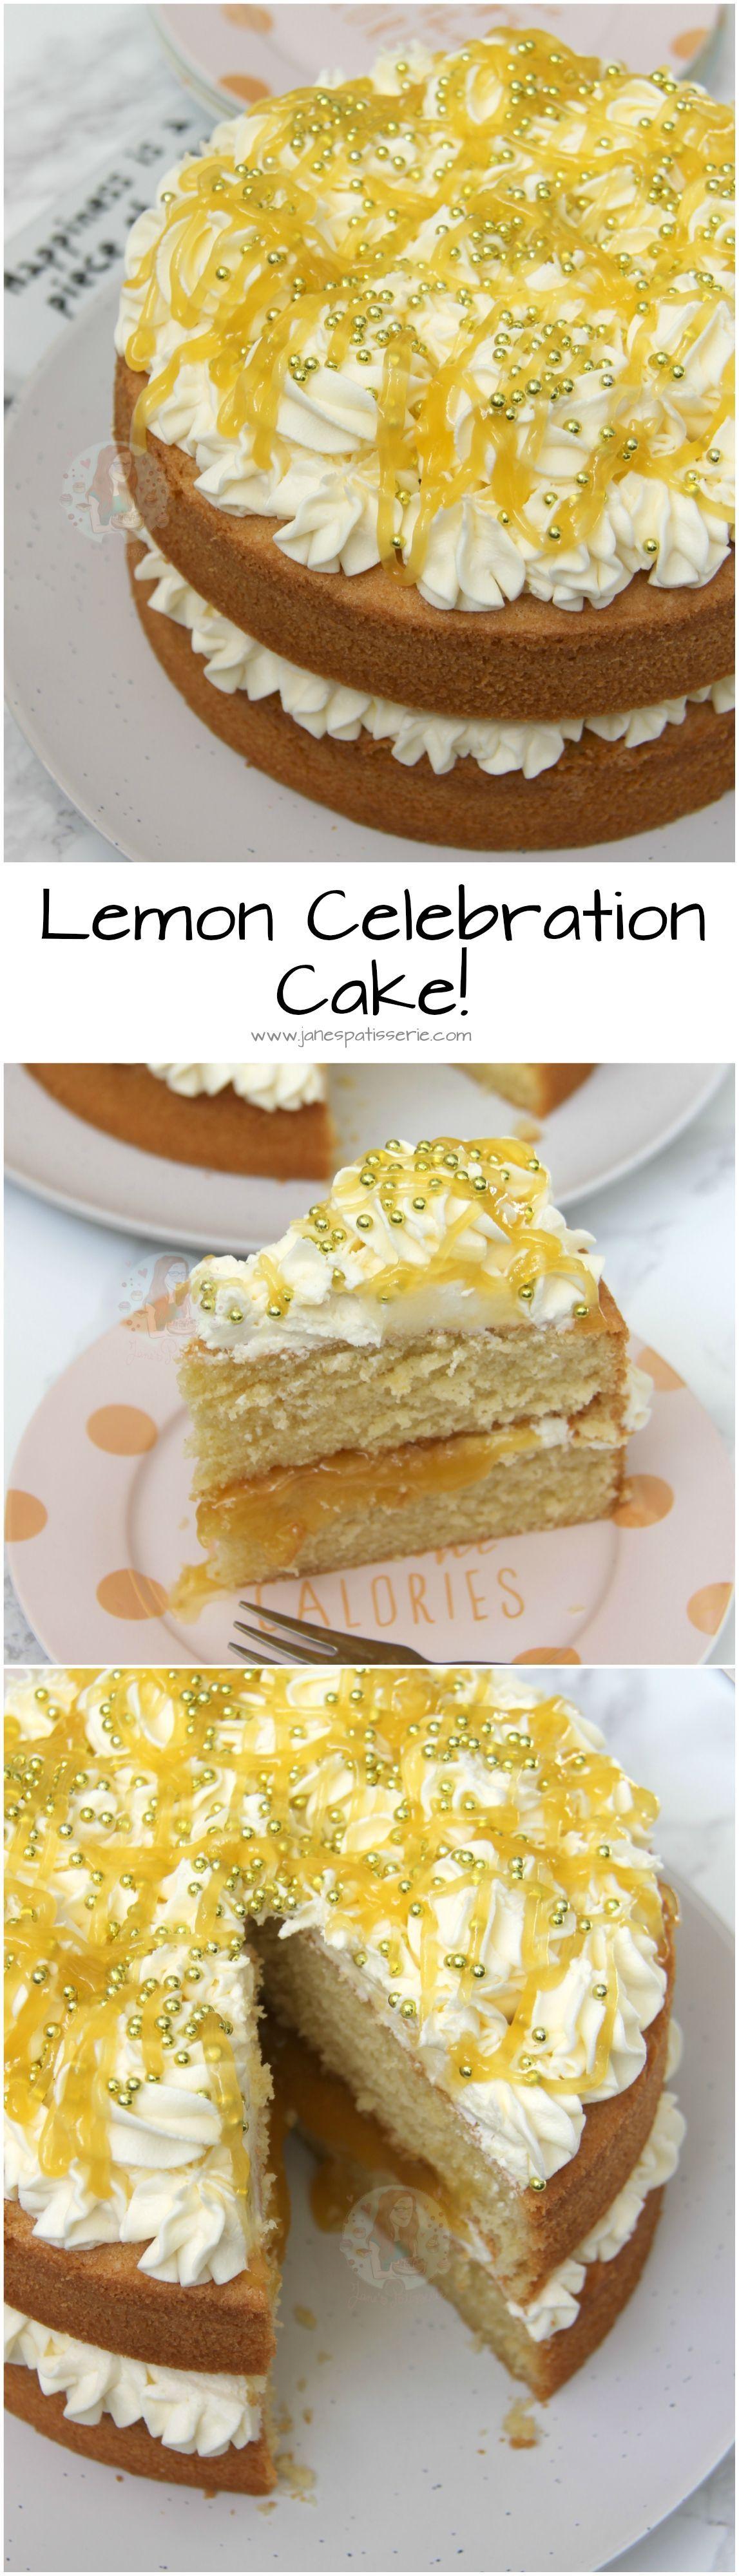 Lemon Celebration Cake! ❤️ A Delicious, Light & Lemony Sponge filled with a dash of Lemon Curd, and a Luscious Lemon Buttercream! #lemonbuttercream Lemon Celebration Cake! ❤️ A Delicious, Light & Lemony Sponge filled with a dash of Lemon Curd, and a Luscious Lemon Buttercream! #lemonbuttercream